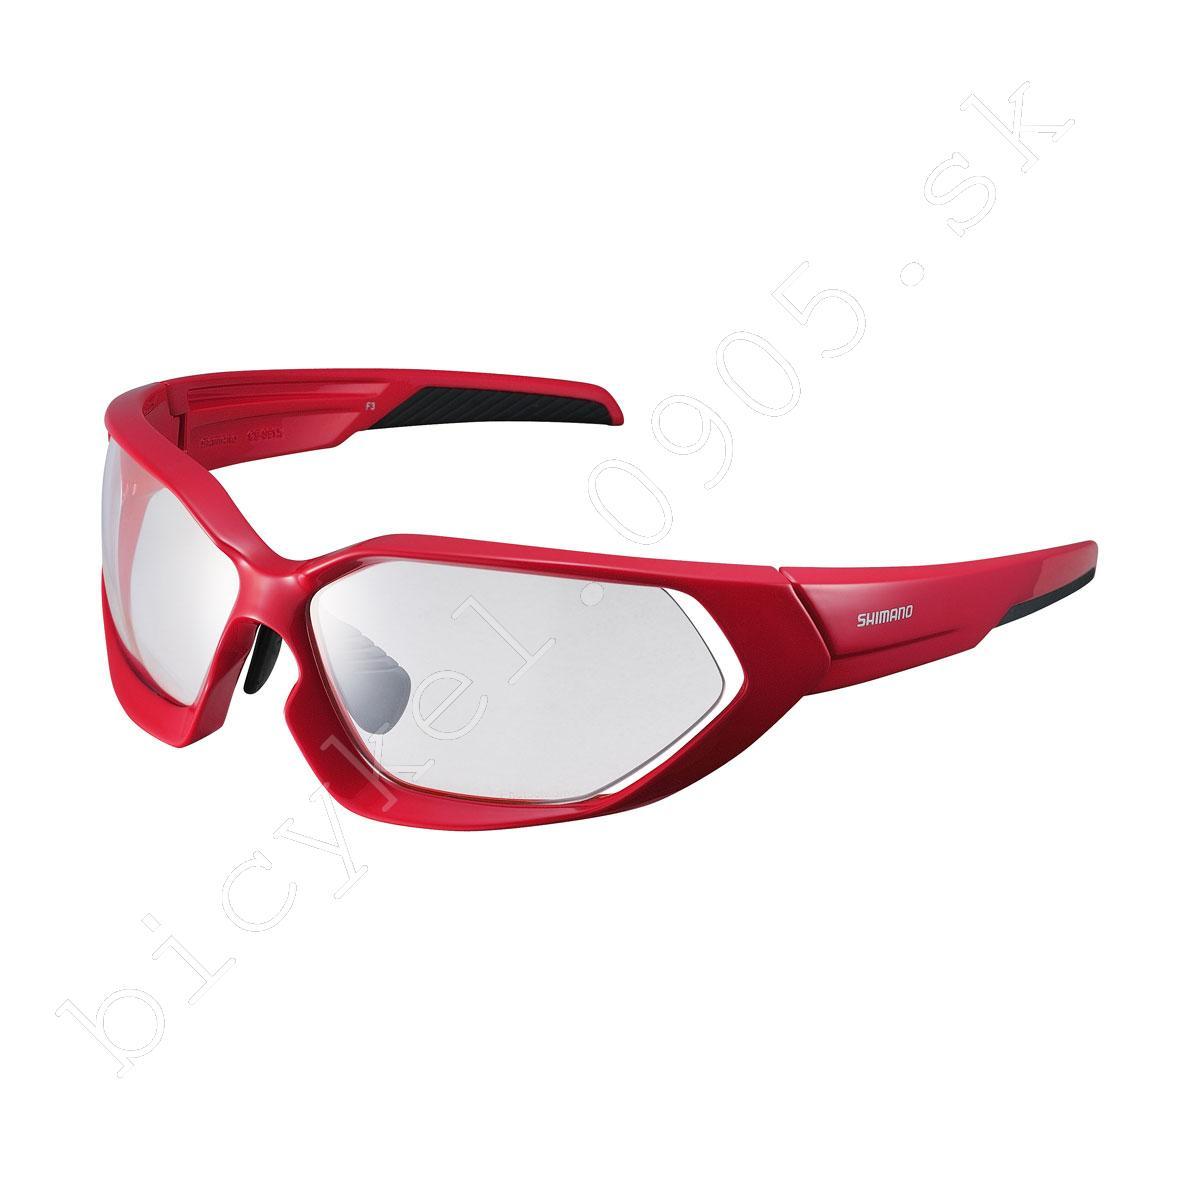 e3a11e7b9 bicykel,bicykle Okuliare ECES51X červeno/čierne fotochromatické číre ...